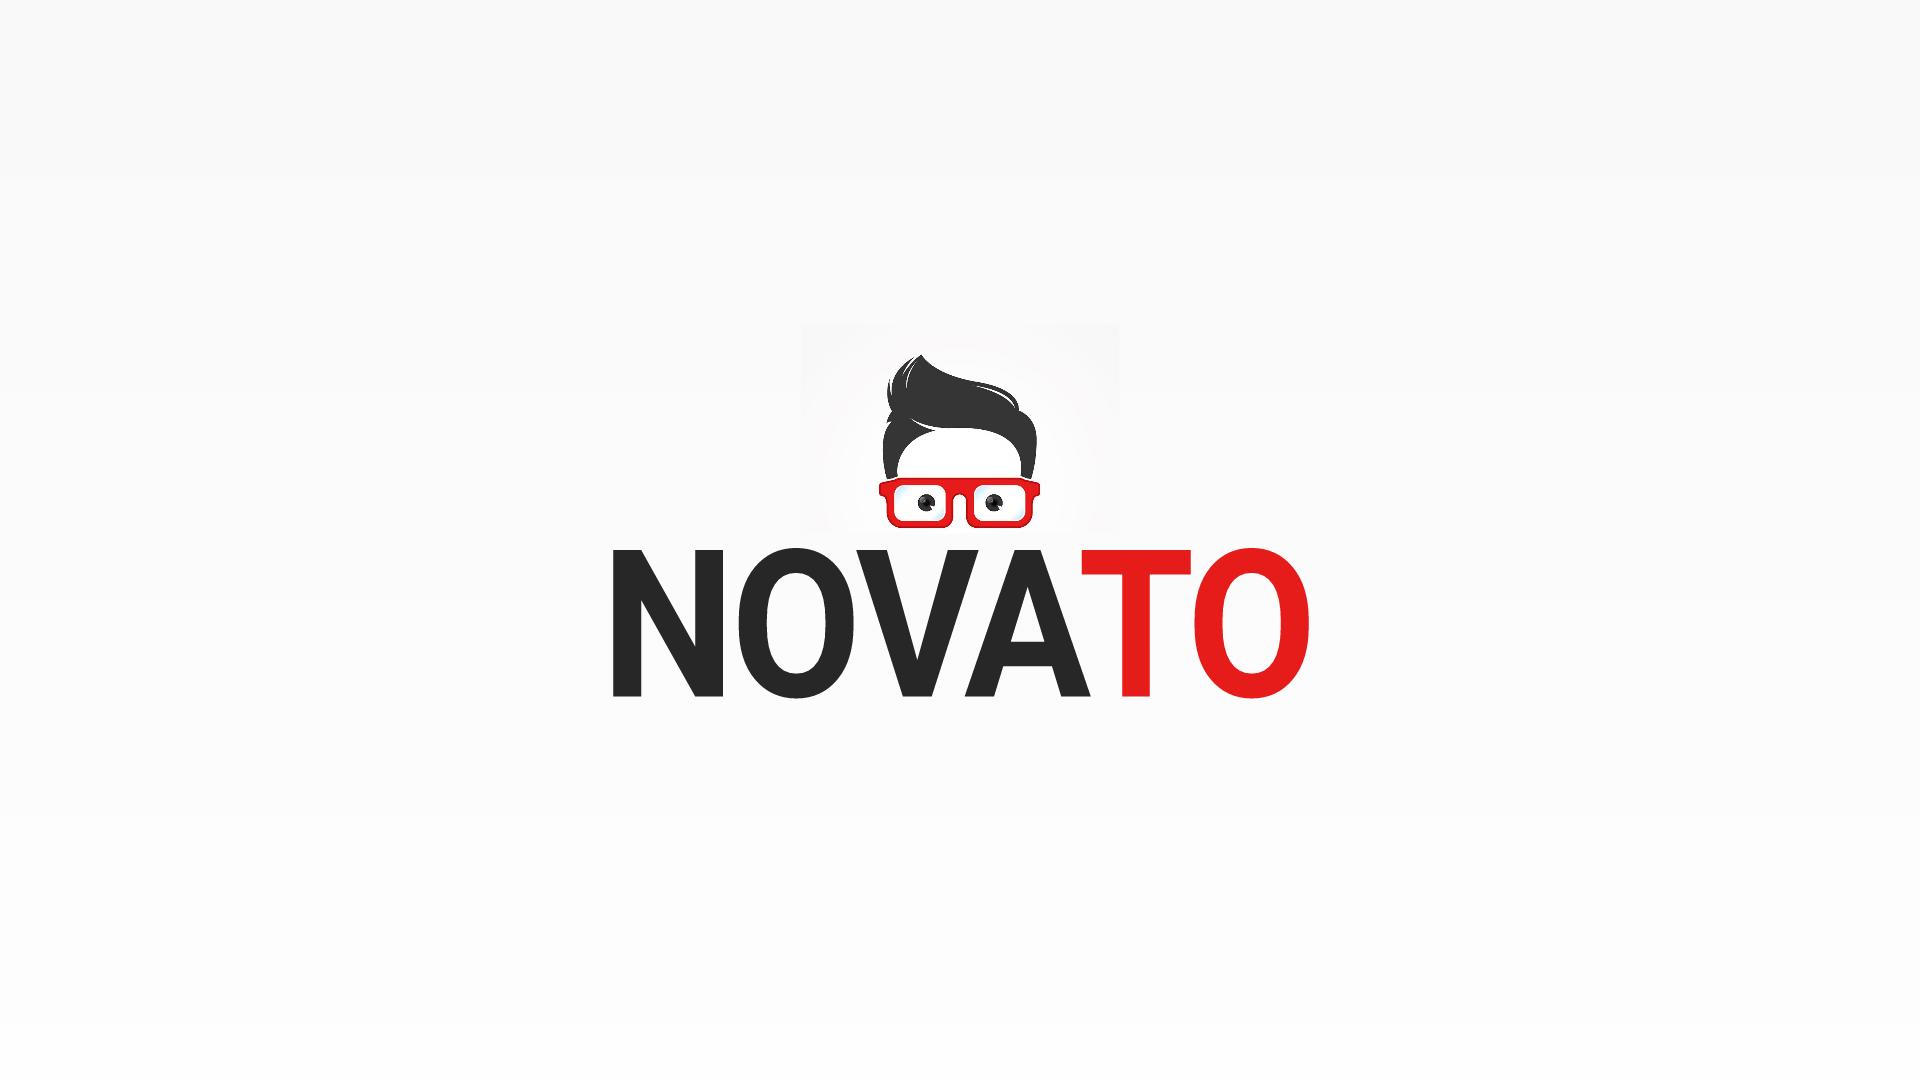 Novato's Content - Armbian forum